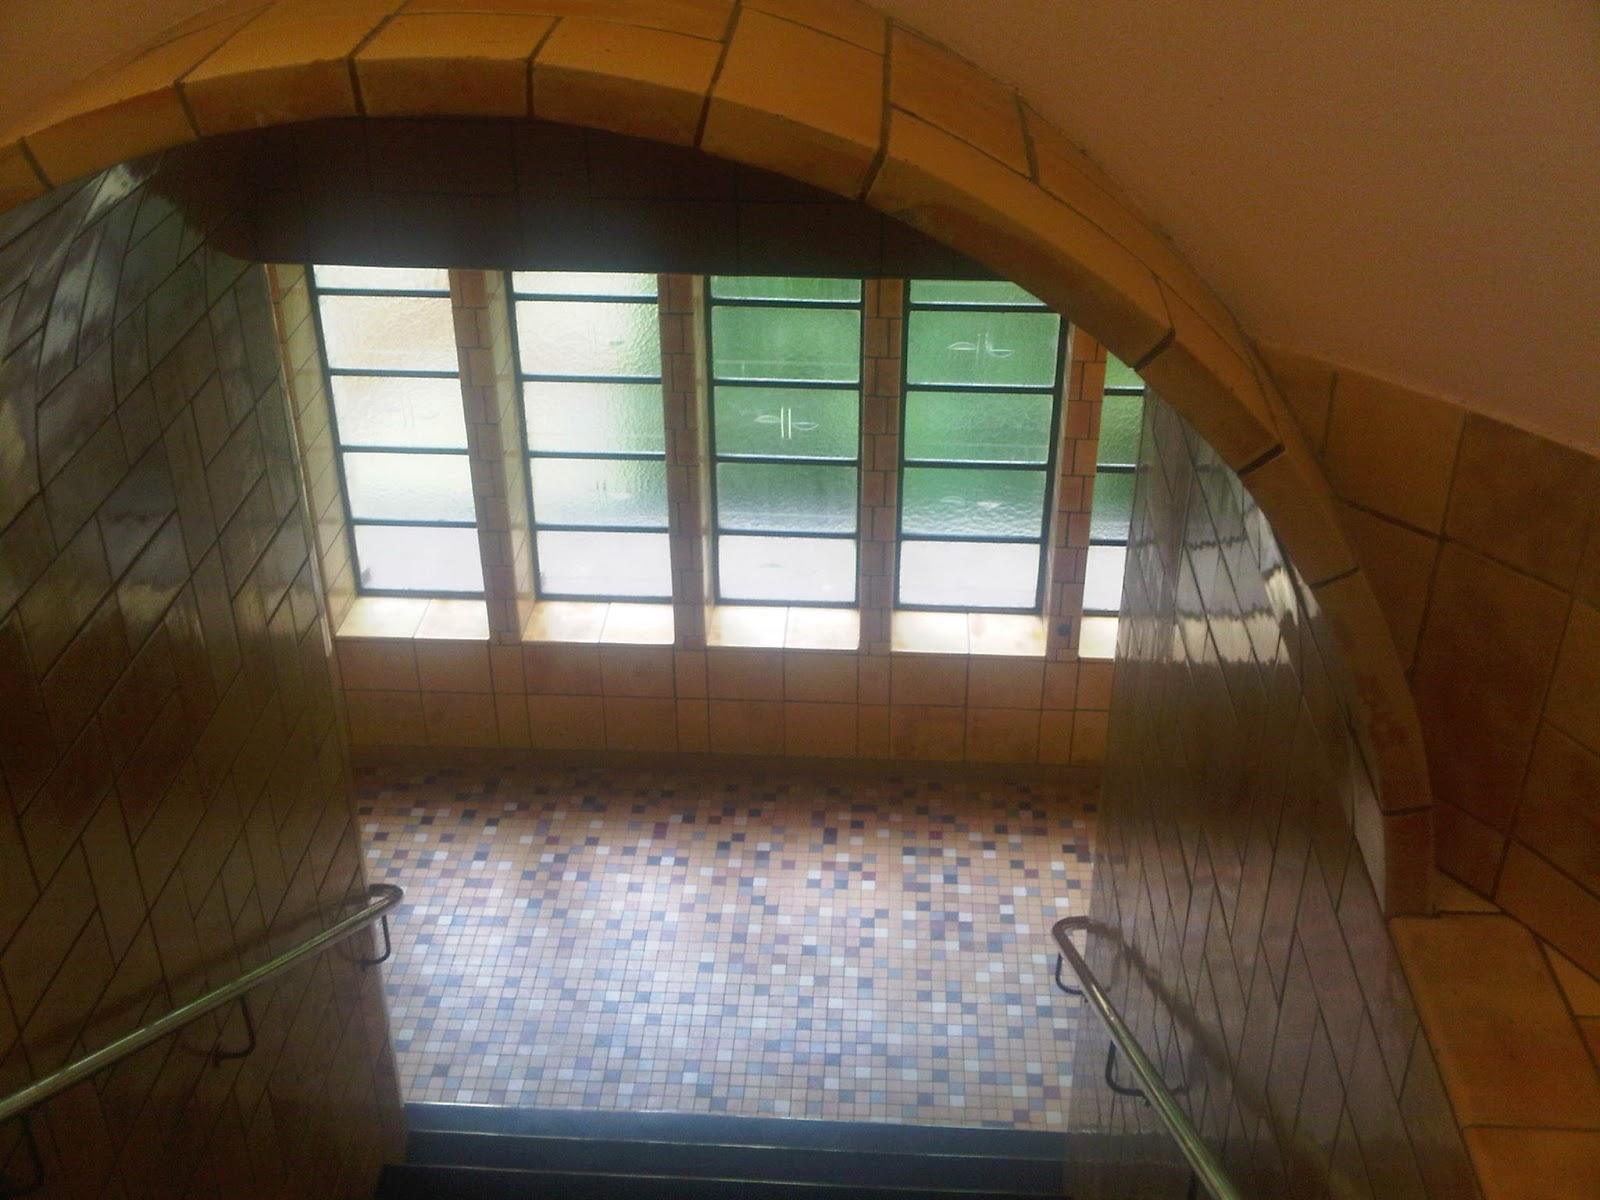 Treppenhaus im Brahms-Kontor